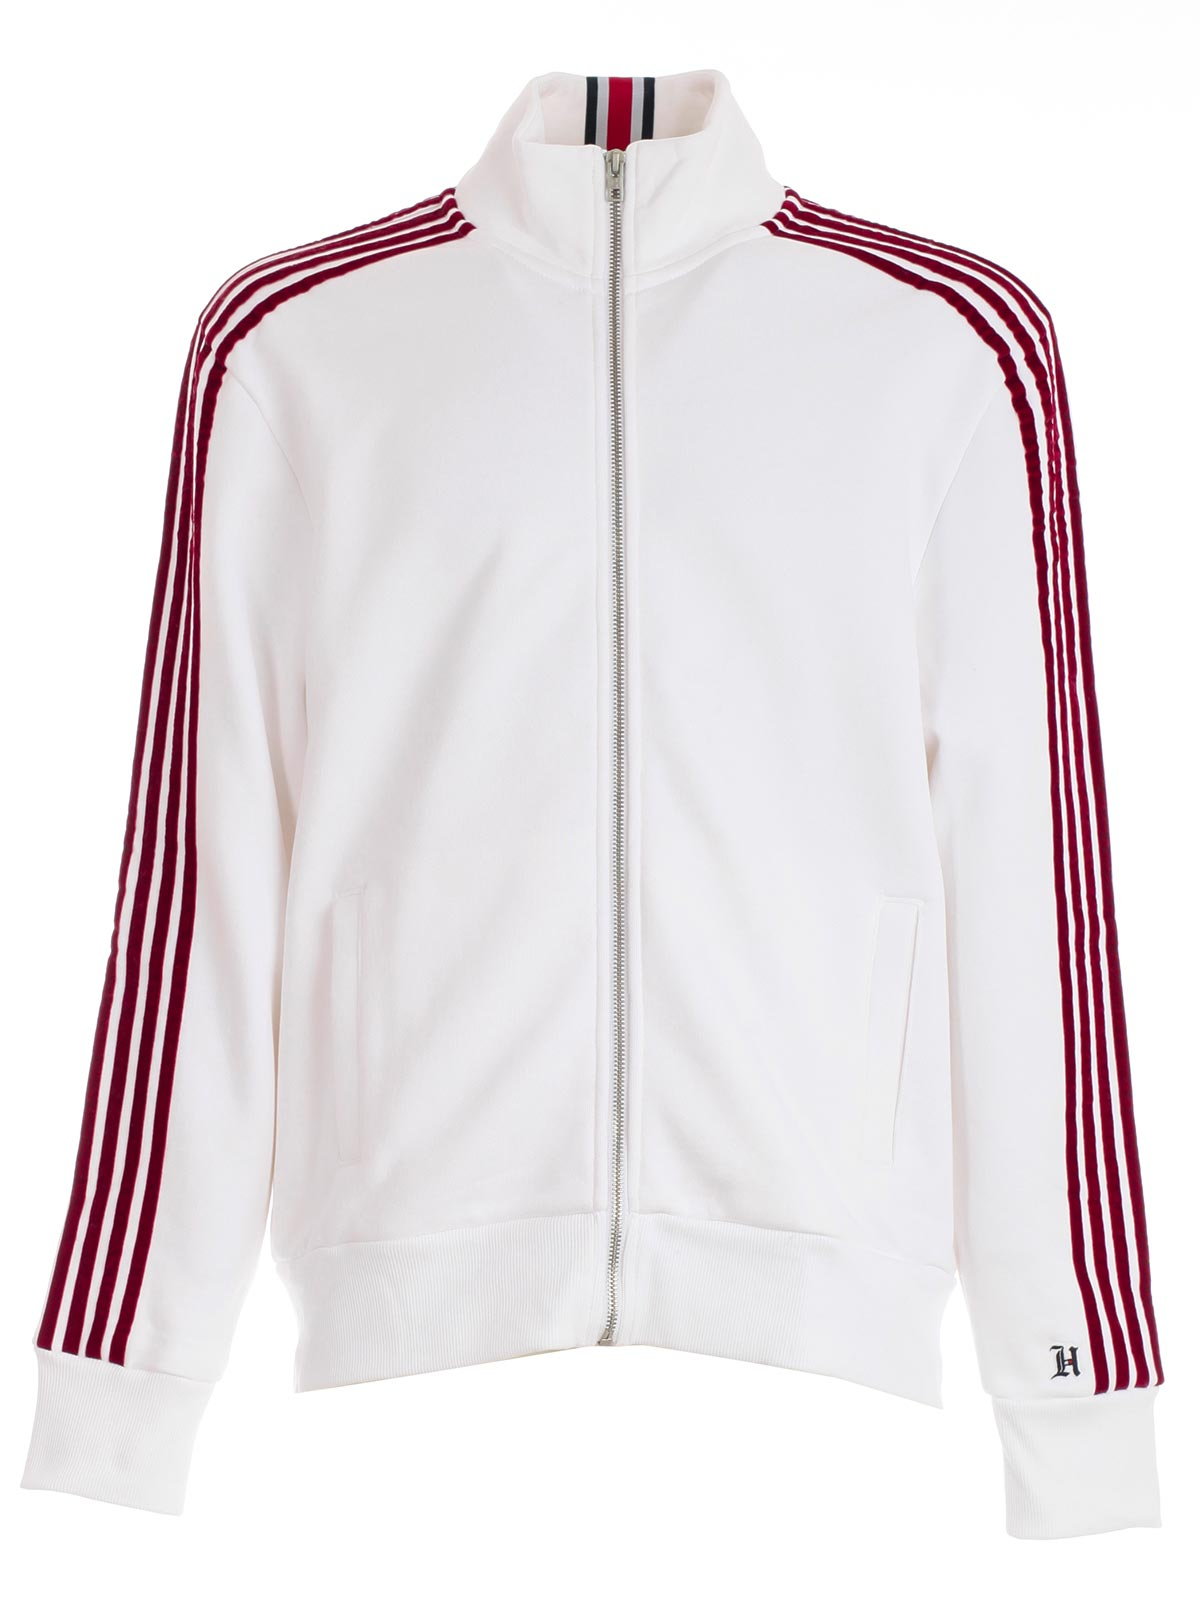 Picture of Tommy Hilfiger Sport Jacket